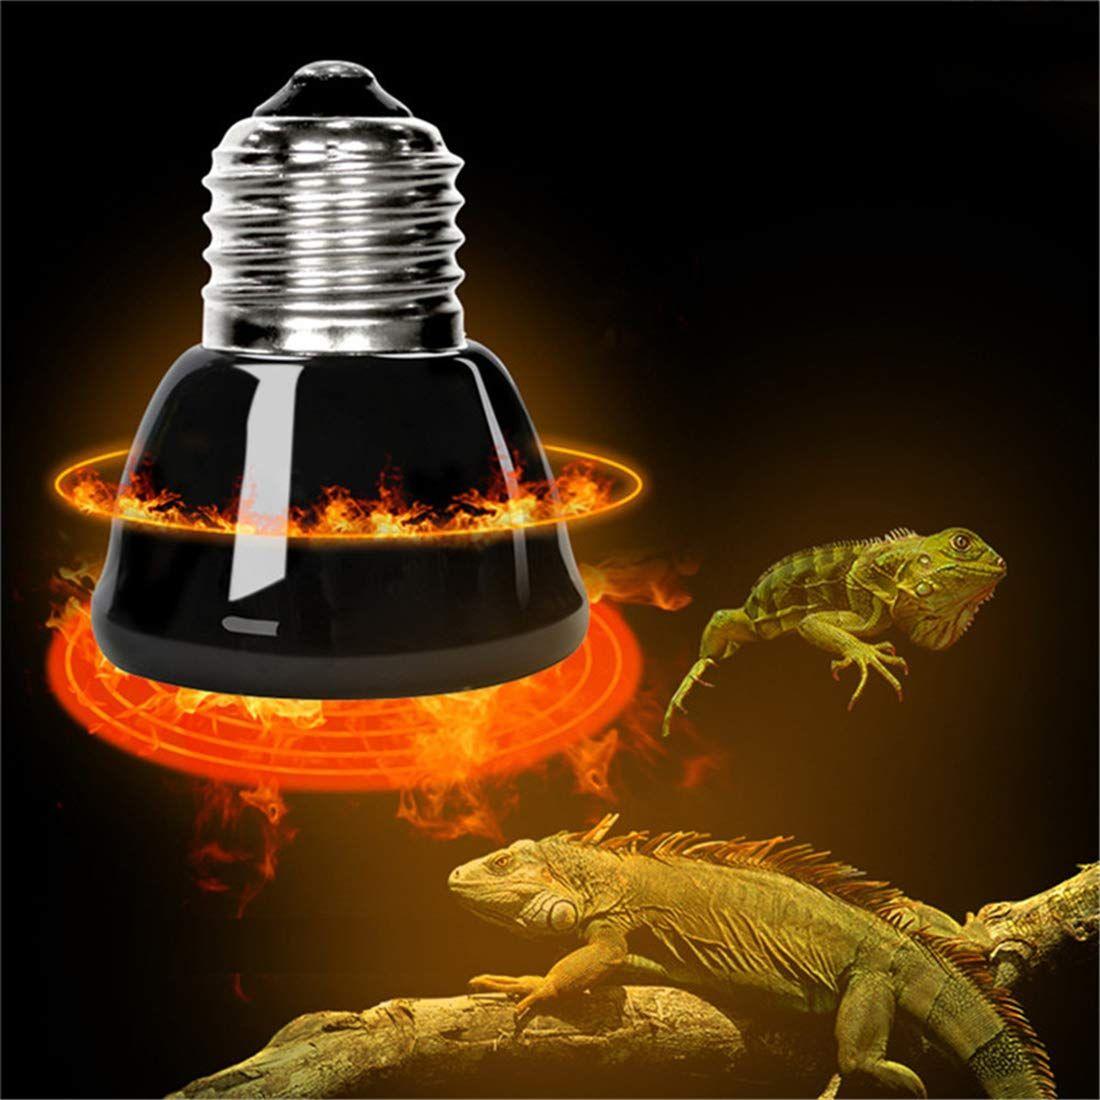 Kangxiaoyan Heating Lamp Black Infrared Ceramic Emitter Heat Light Bulb Pet Brooder Chickens Reptile Lamp 25 50 75 100w Ad Emitter Sponsored Ceramic L